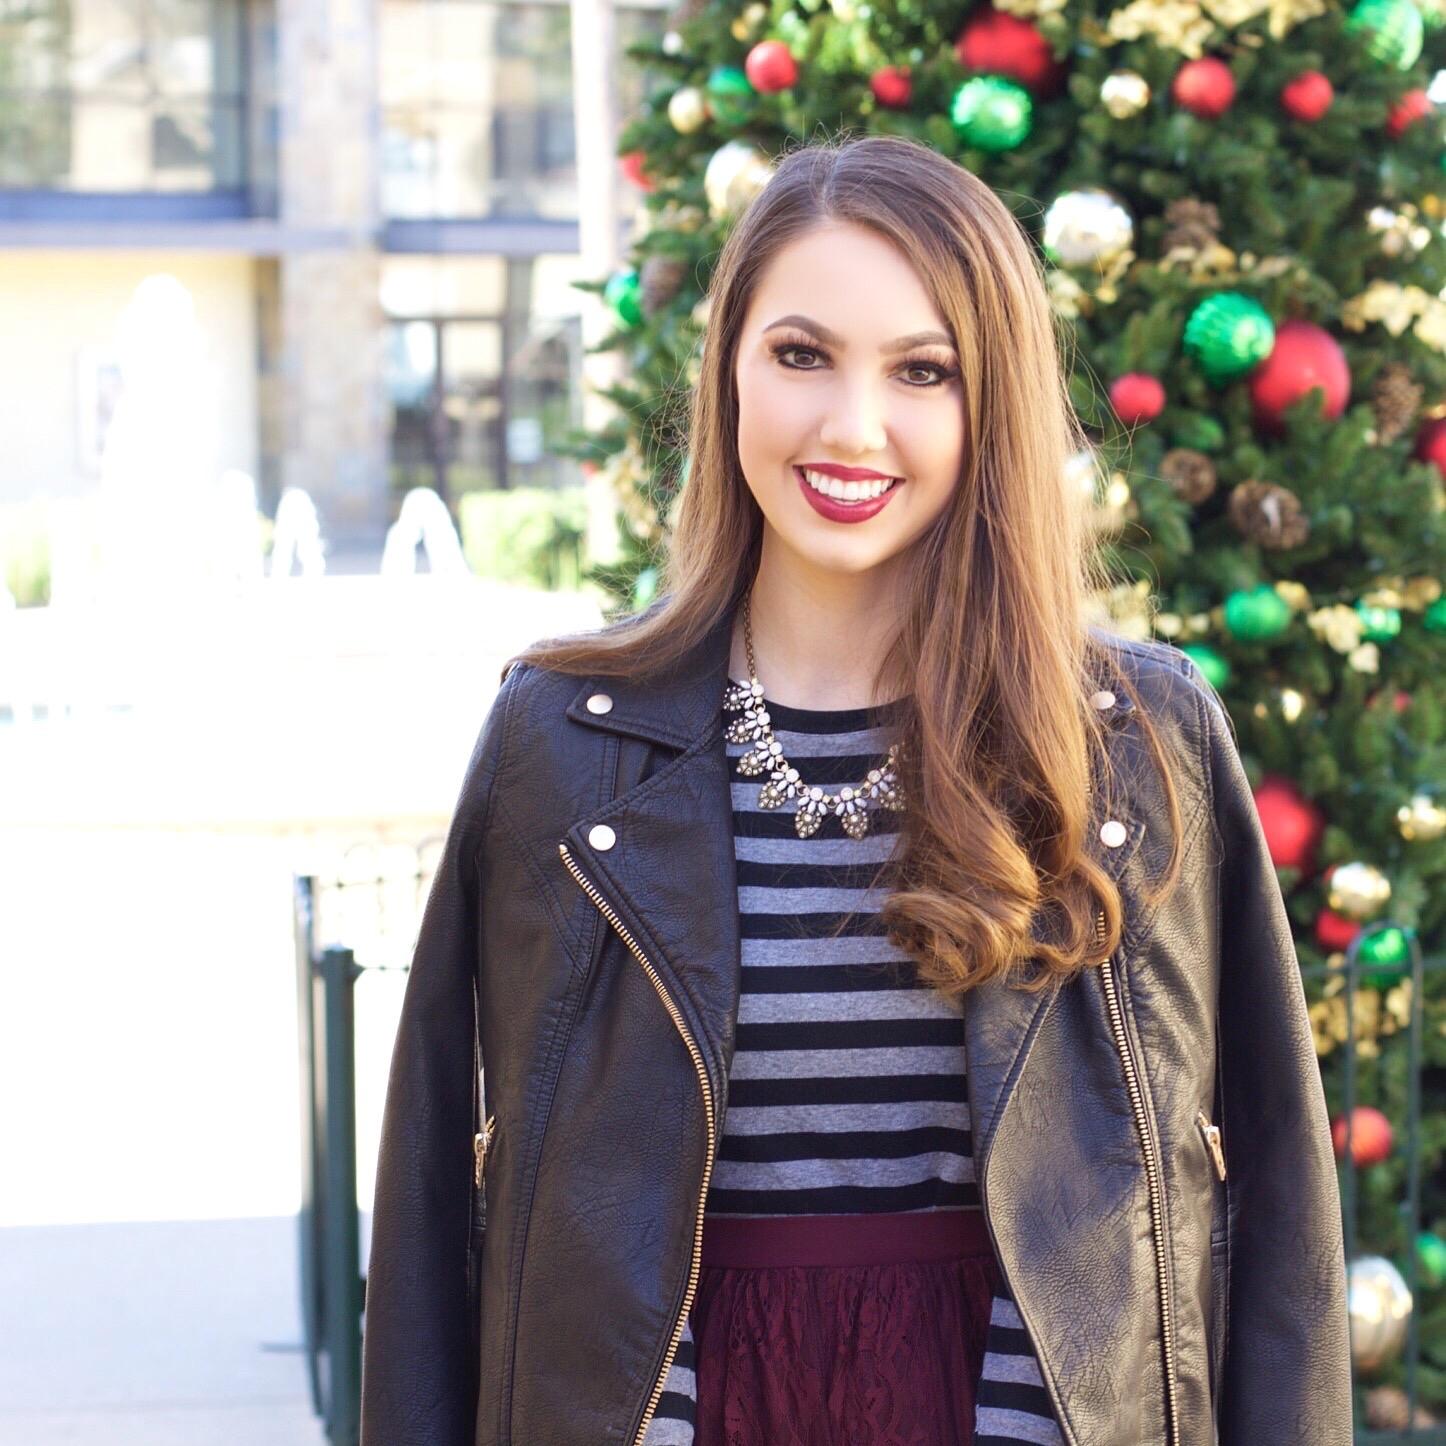 Christmas outfit idea 2017